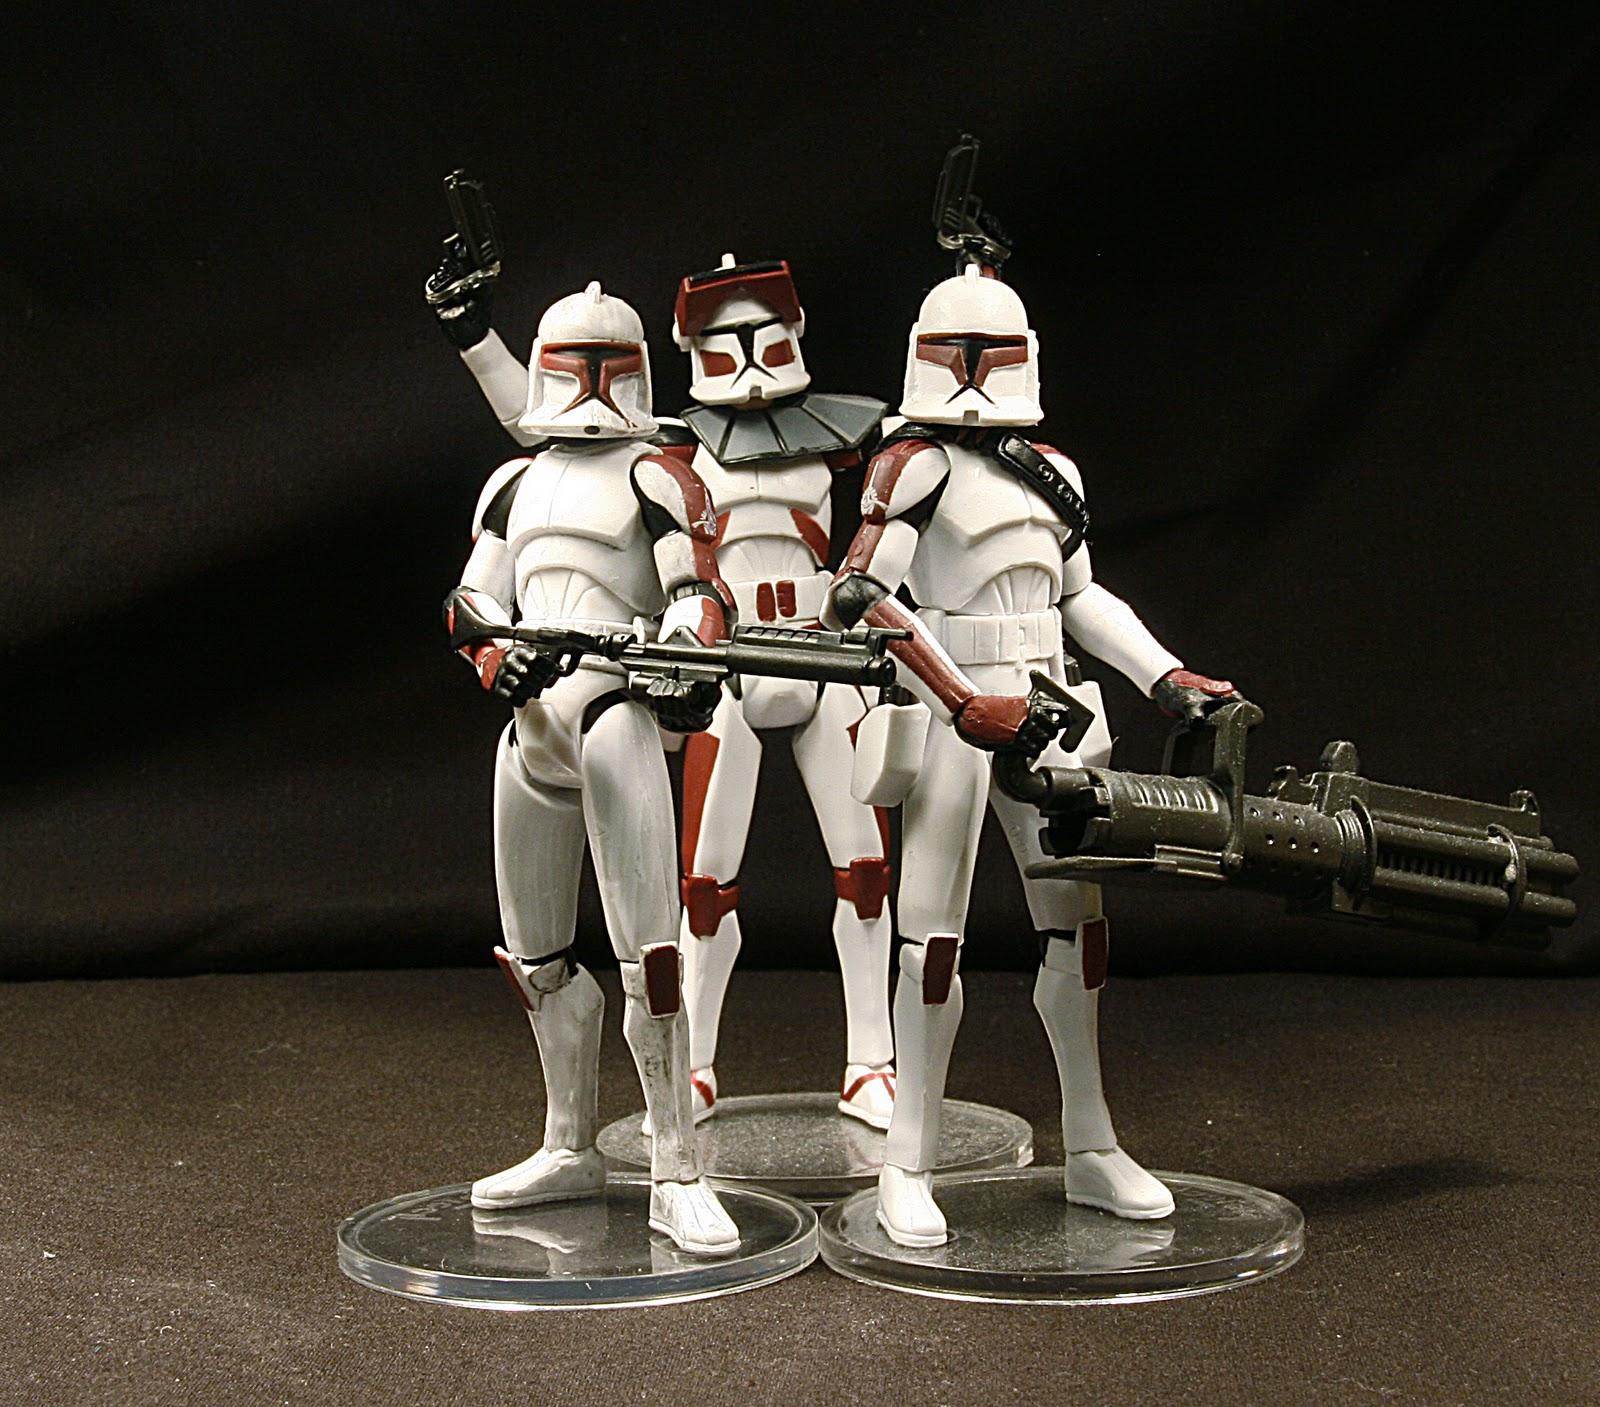 Kisho Meteora, Star Wars Collector: Senate Security Clone